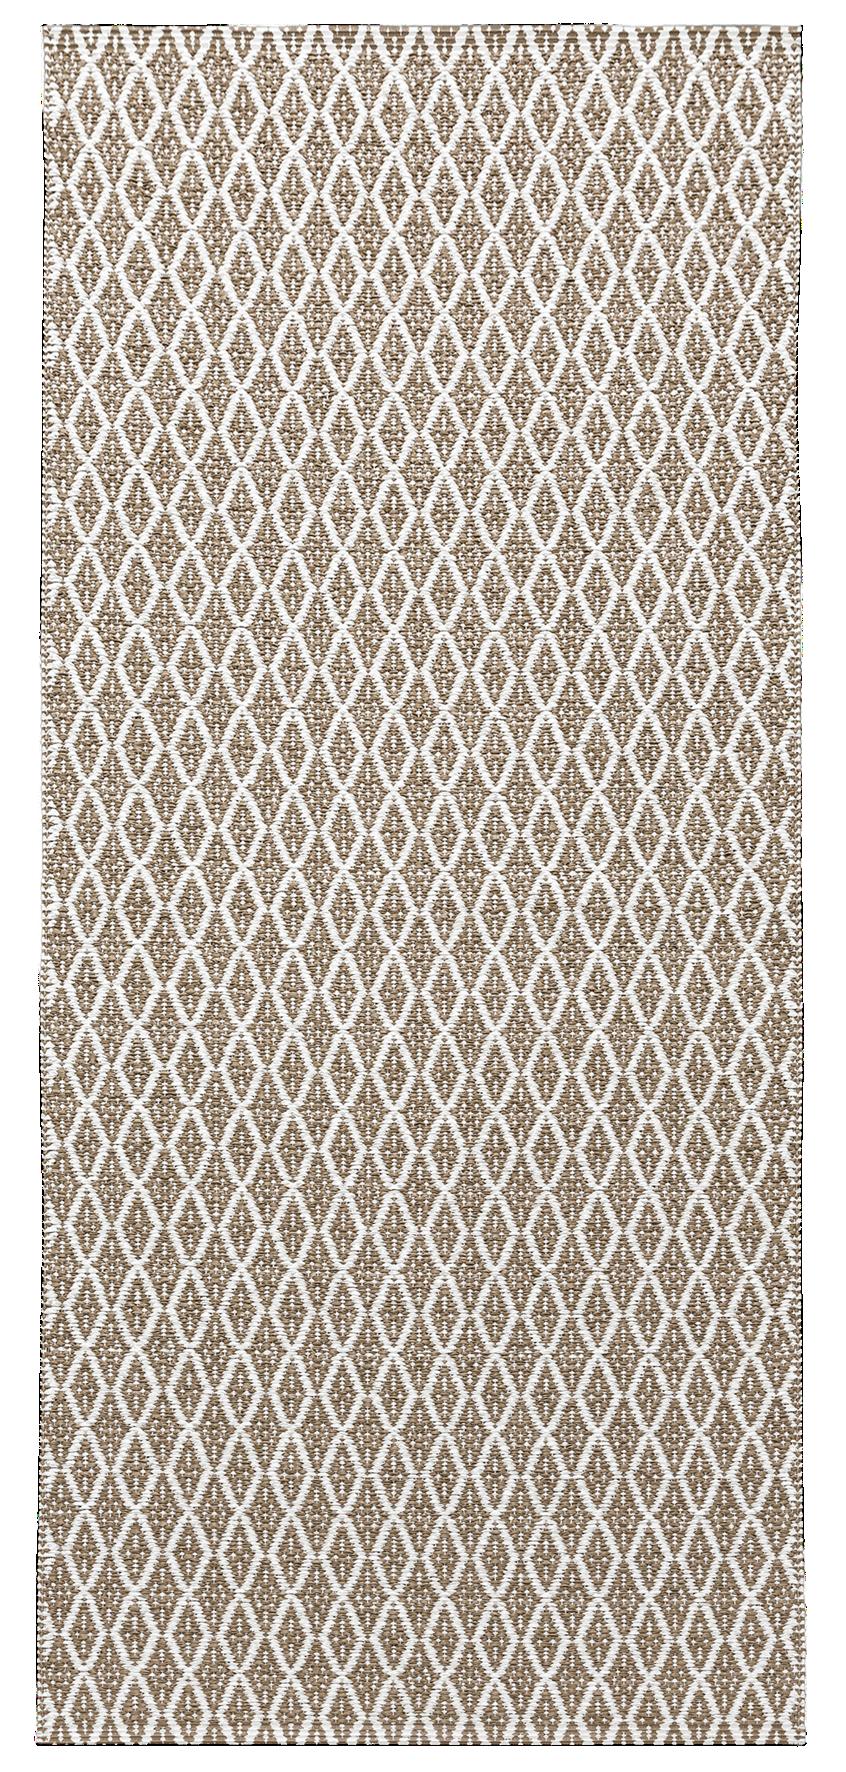 Horredsmattan - Plastmatta Eye 70x300 cm - Natur